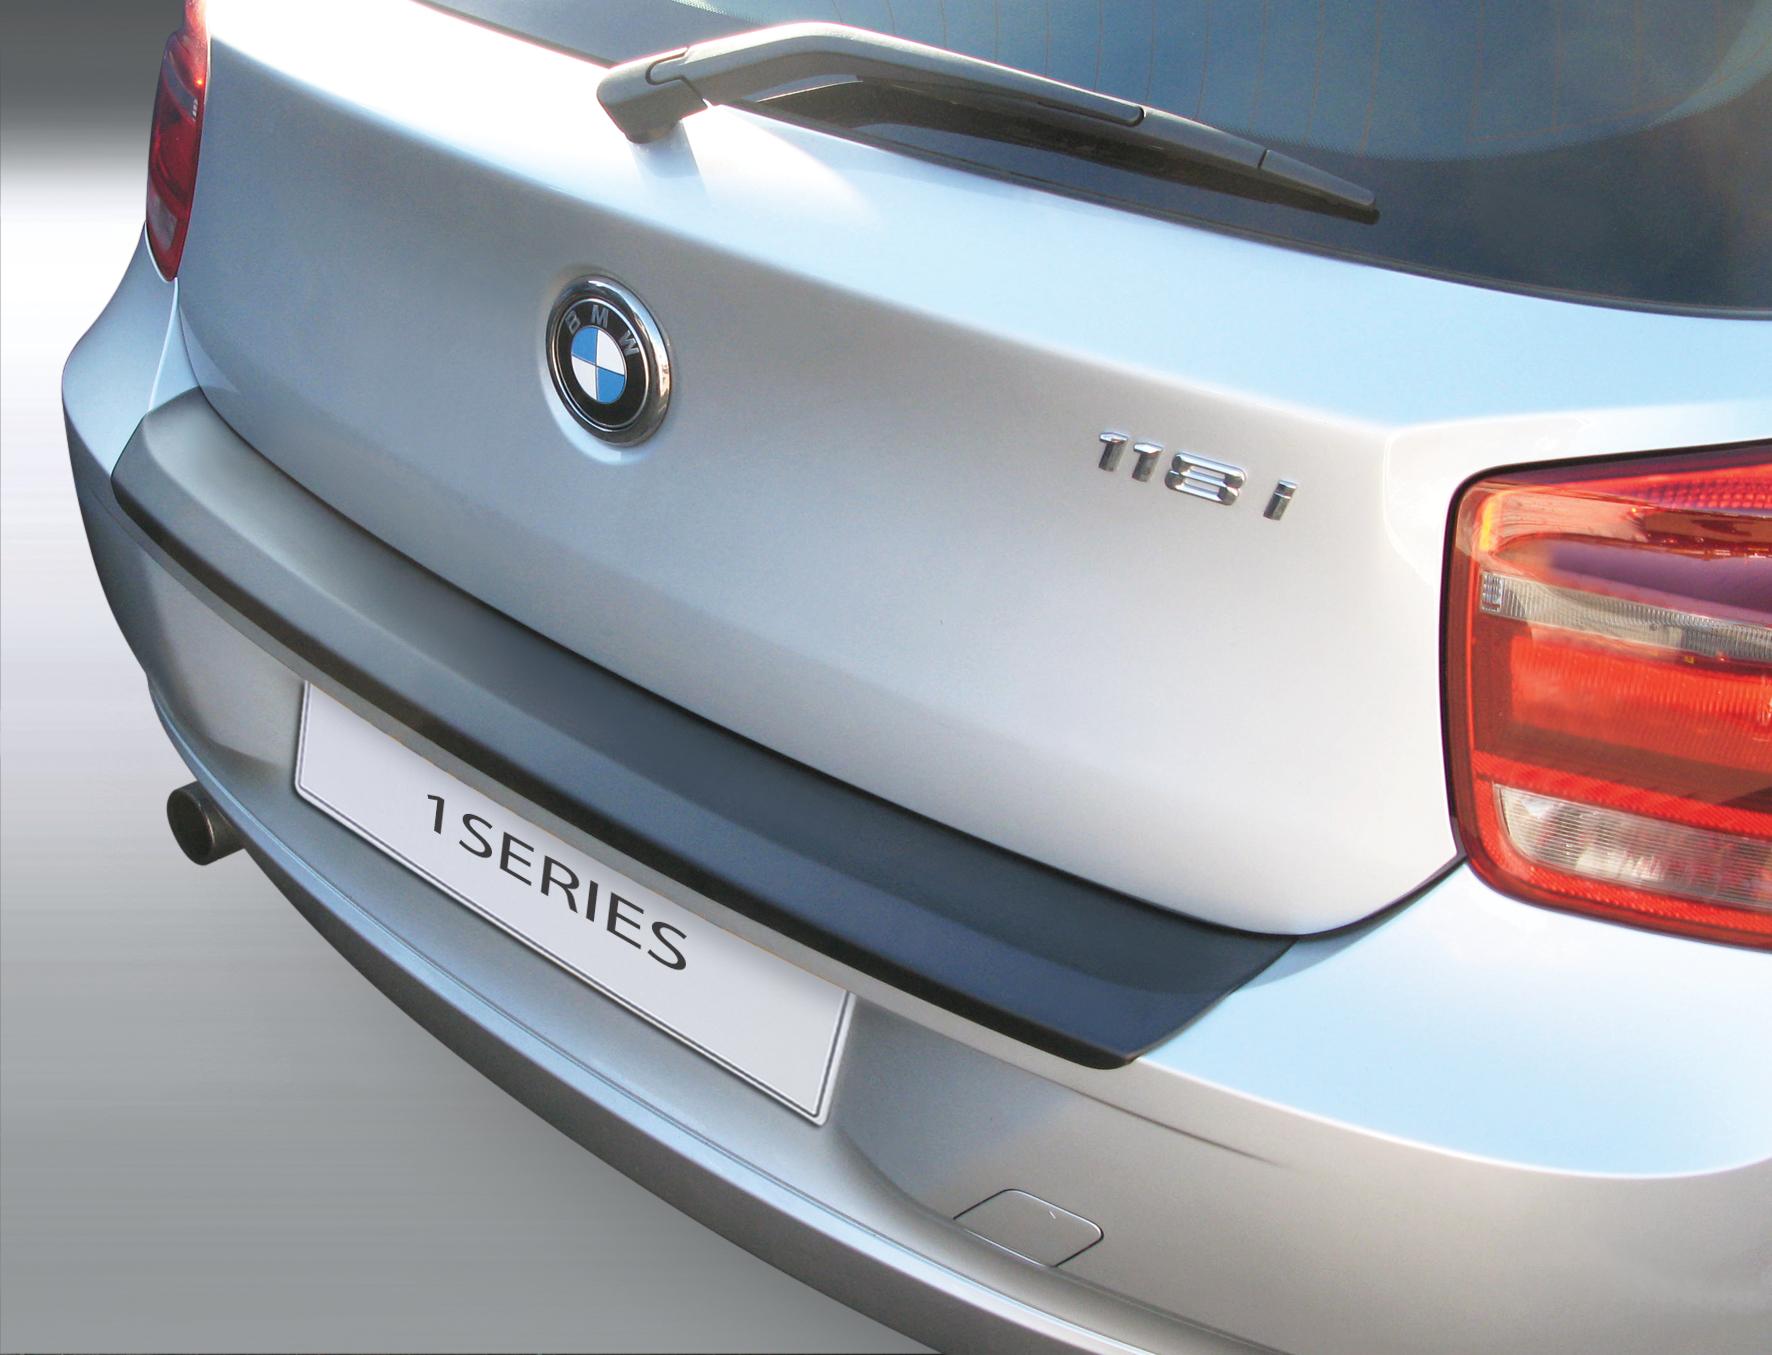 Накладка на задний бампер BMW 1 серии, 5-дв. хэтчбек, кузов F20, 2011-2015